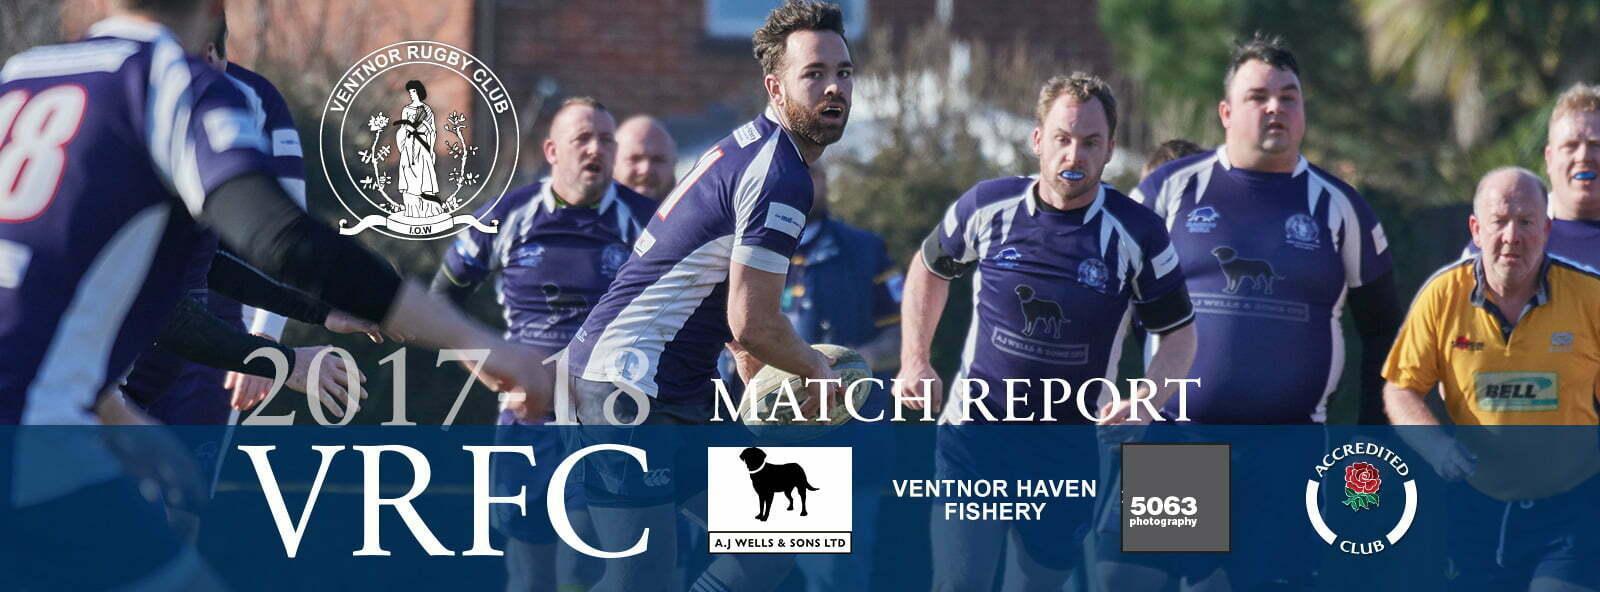 ventnor-rfc-match-report-v-bognor-rfc-away-1600-wide-x-315